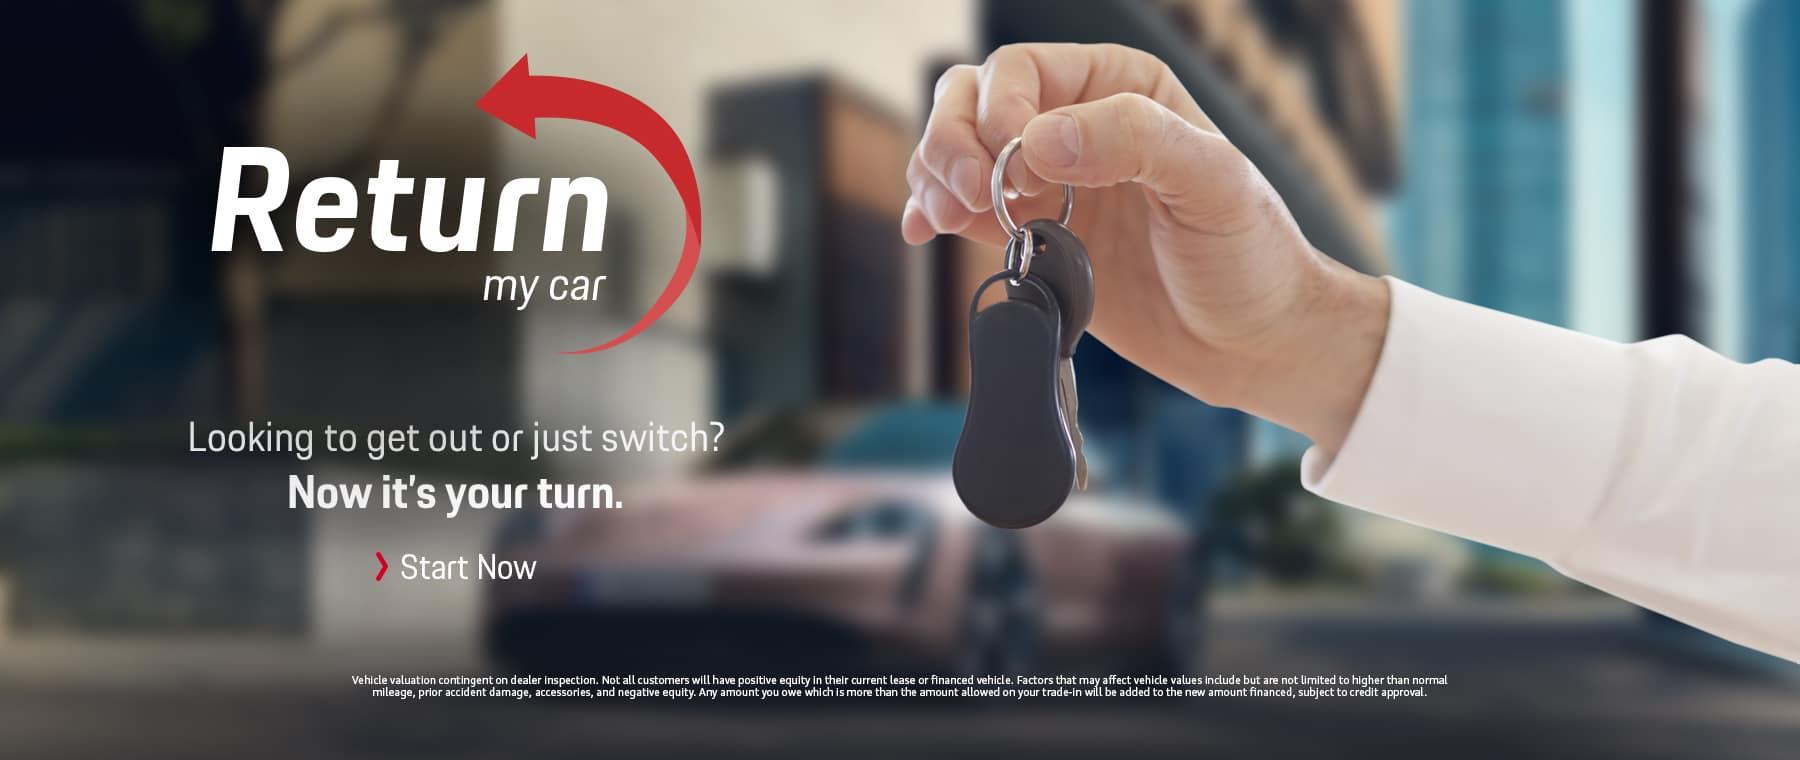 Return my car POW